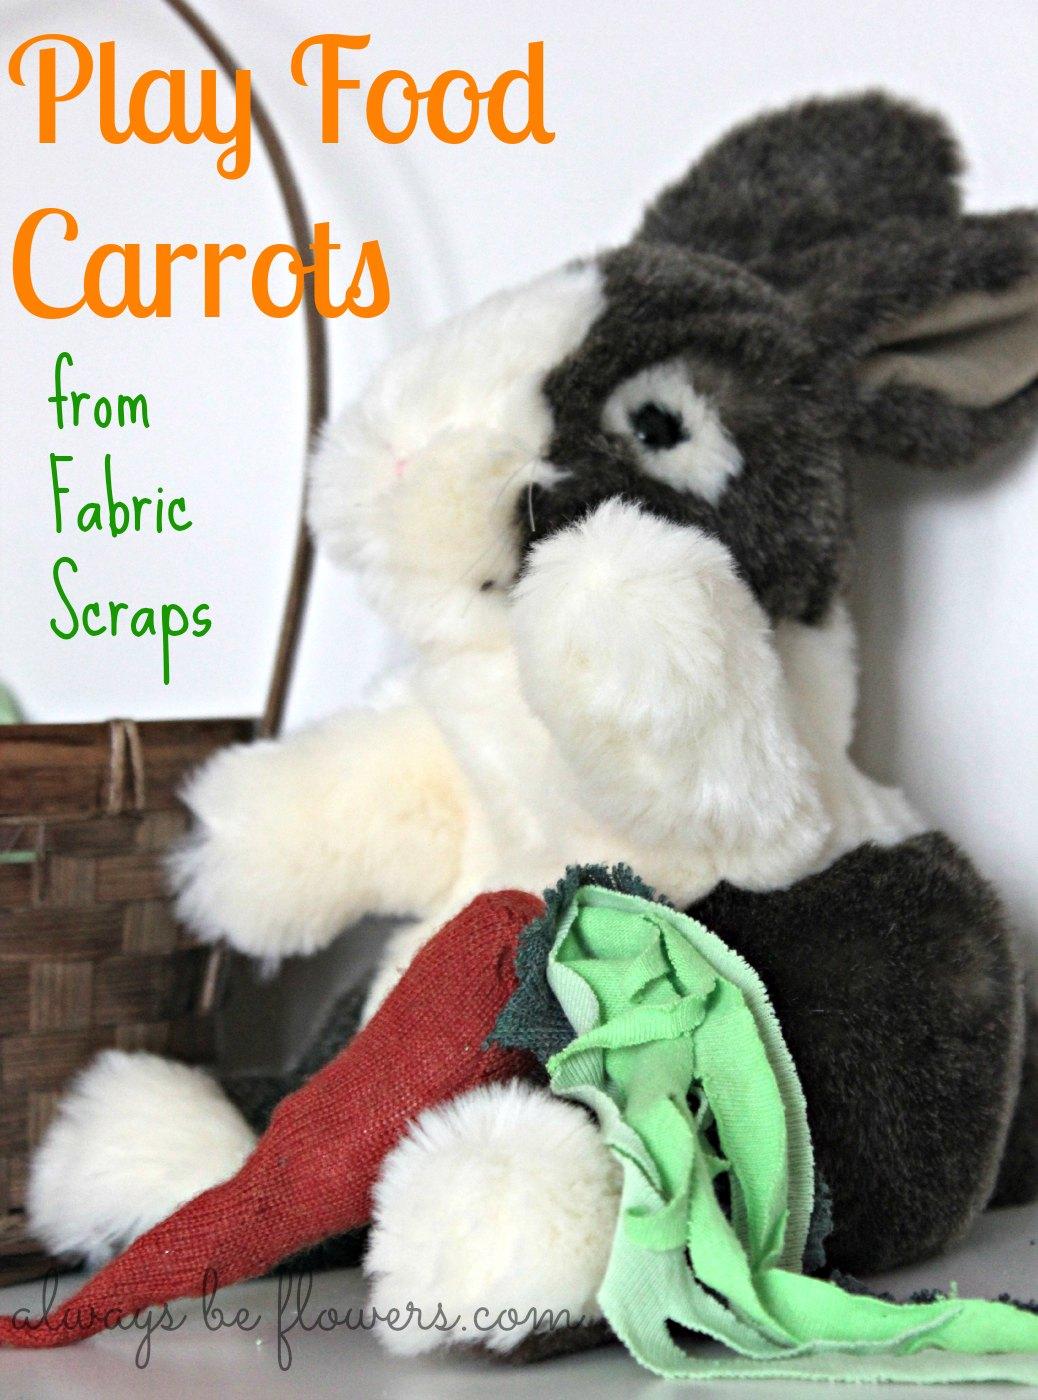 play-food-carrots-fabric-scraps-bunny.jpg